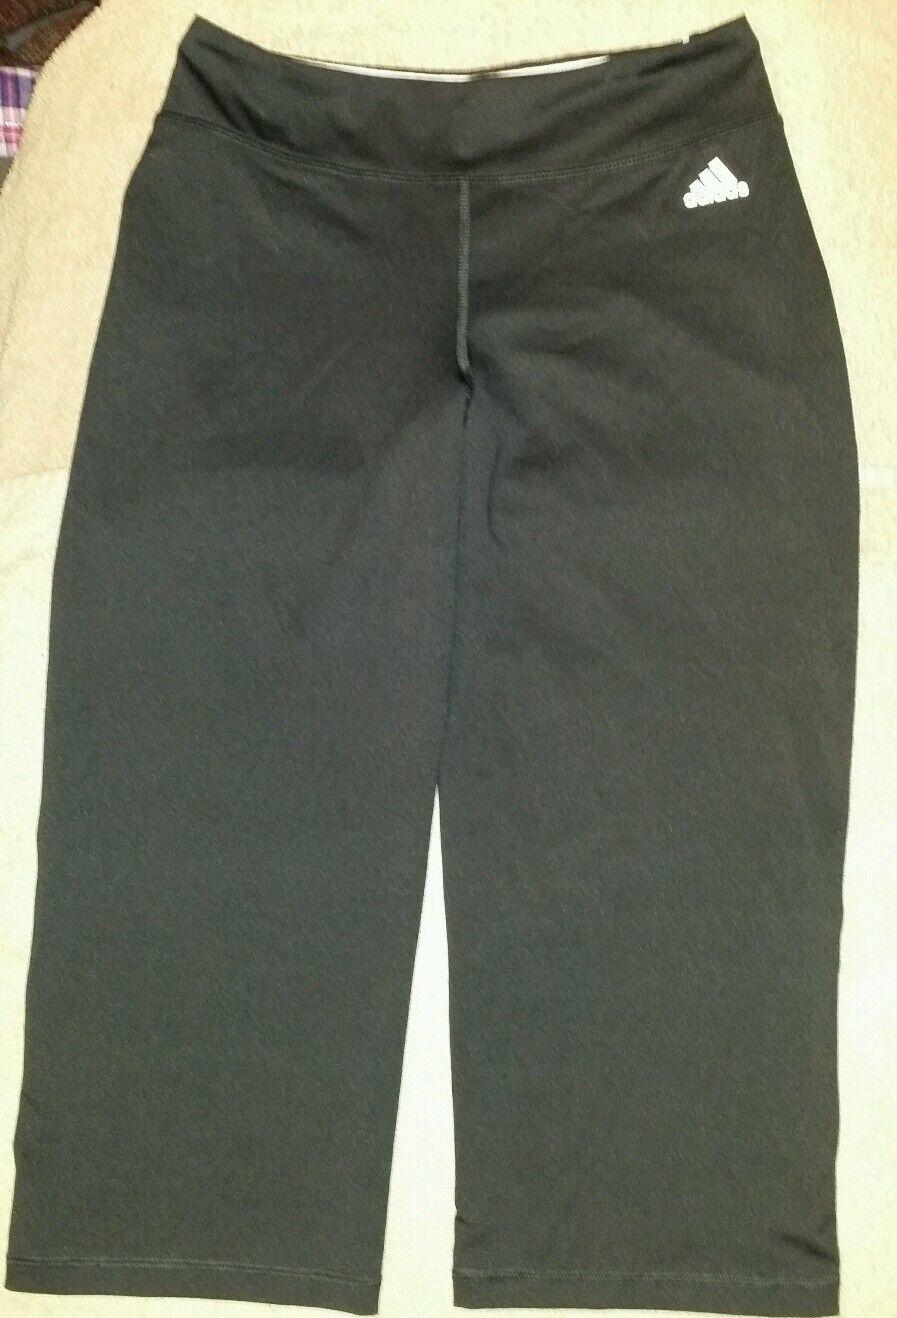 Nő kis adidas fekete fehér capri / edző nadrág